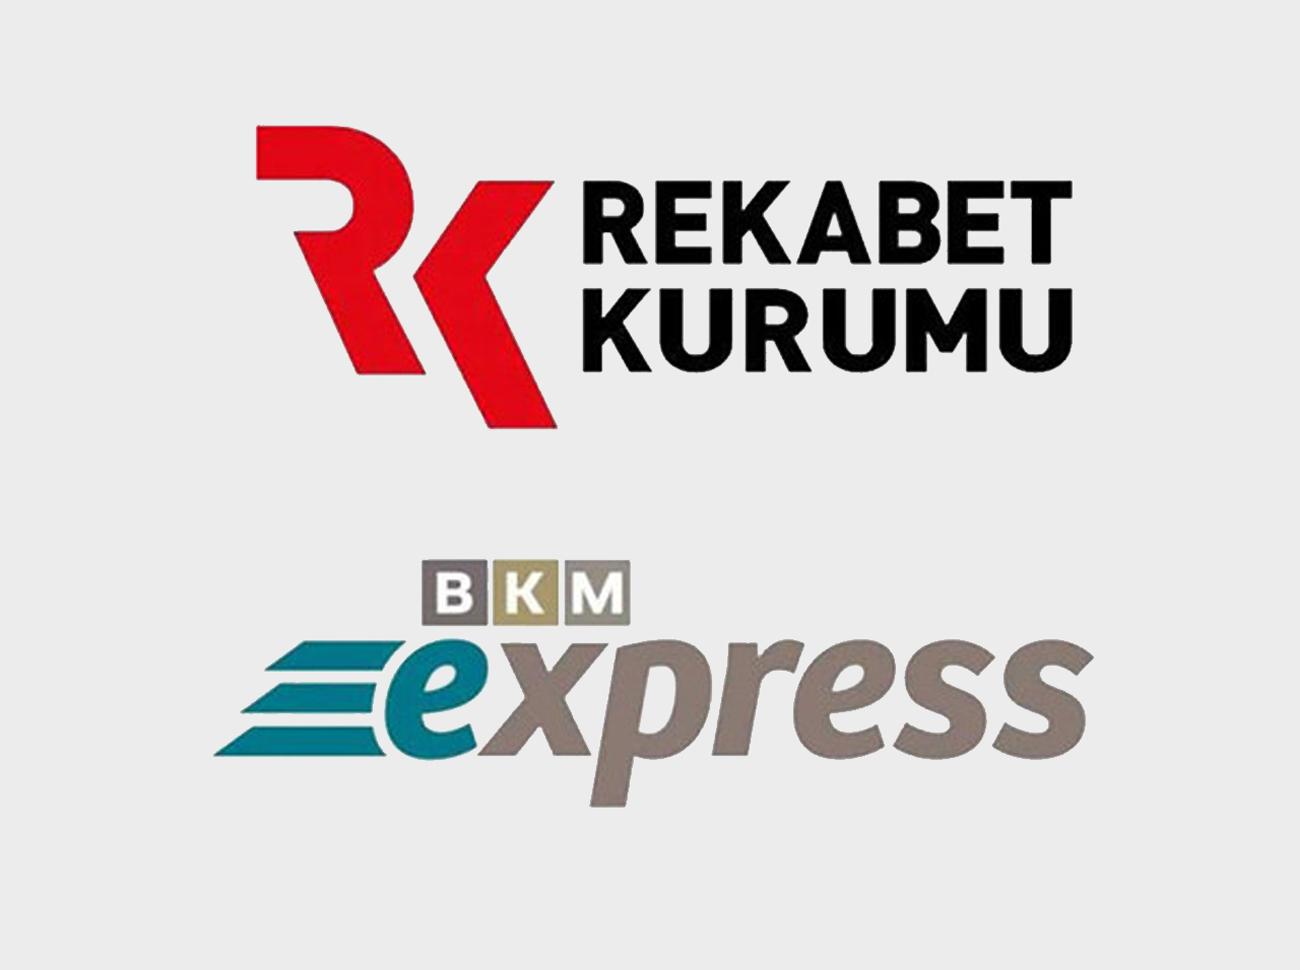 BKM Express Kapanıyor Mu?